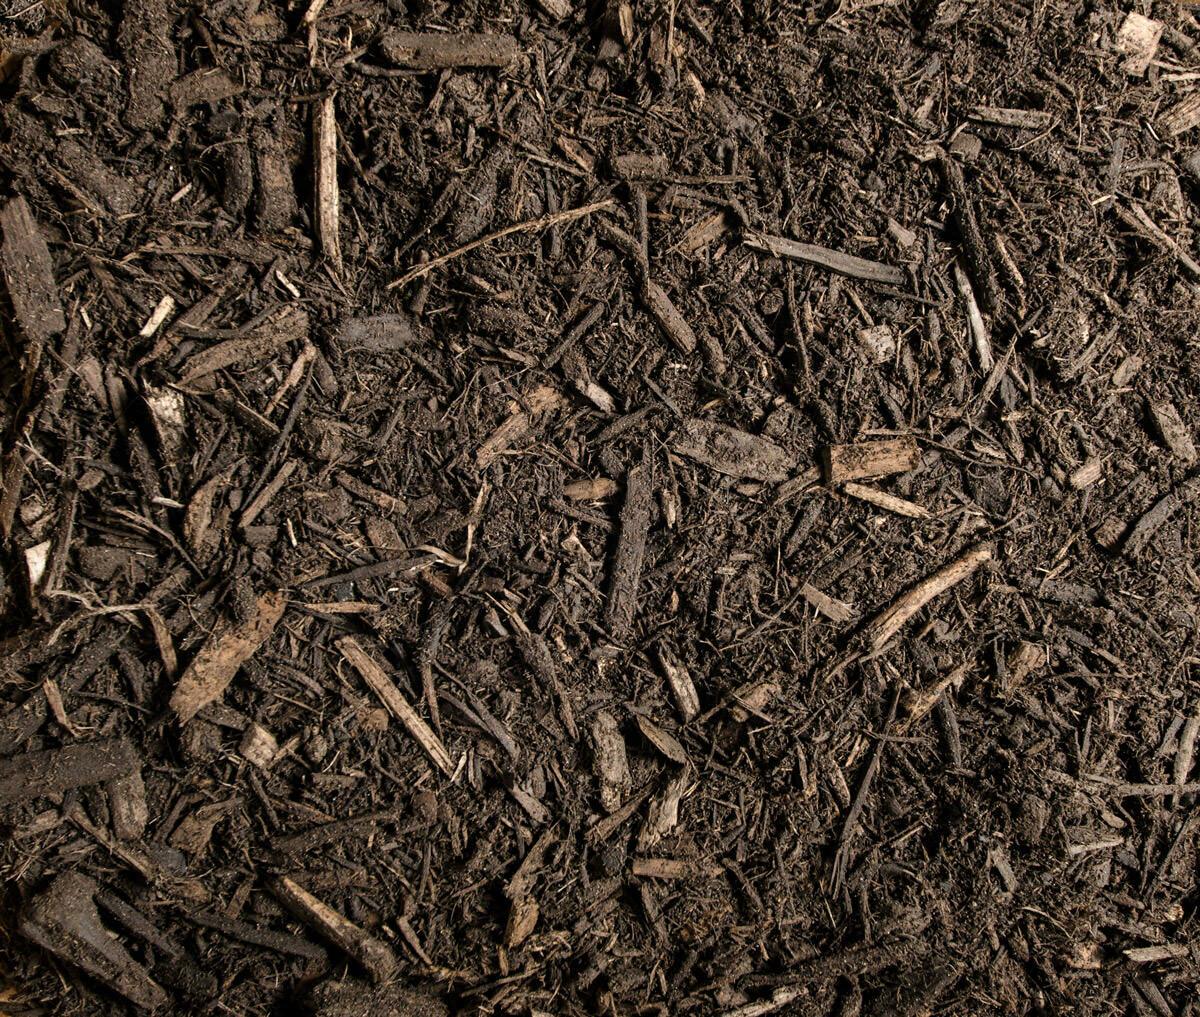 Natural Hardwood Mulch 2 c/ft Bag